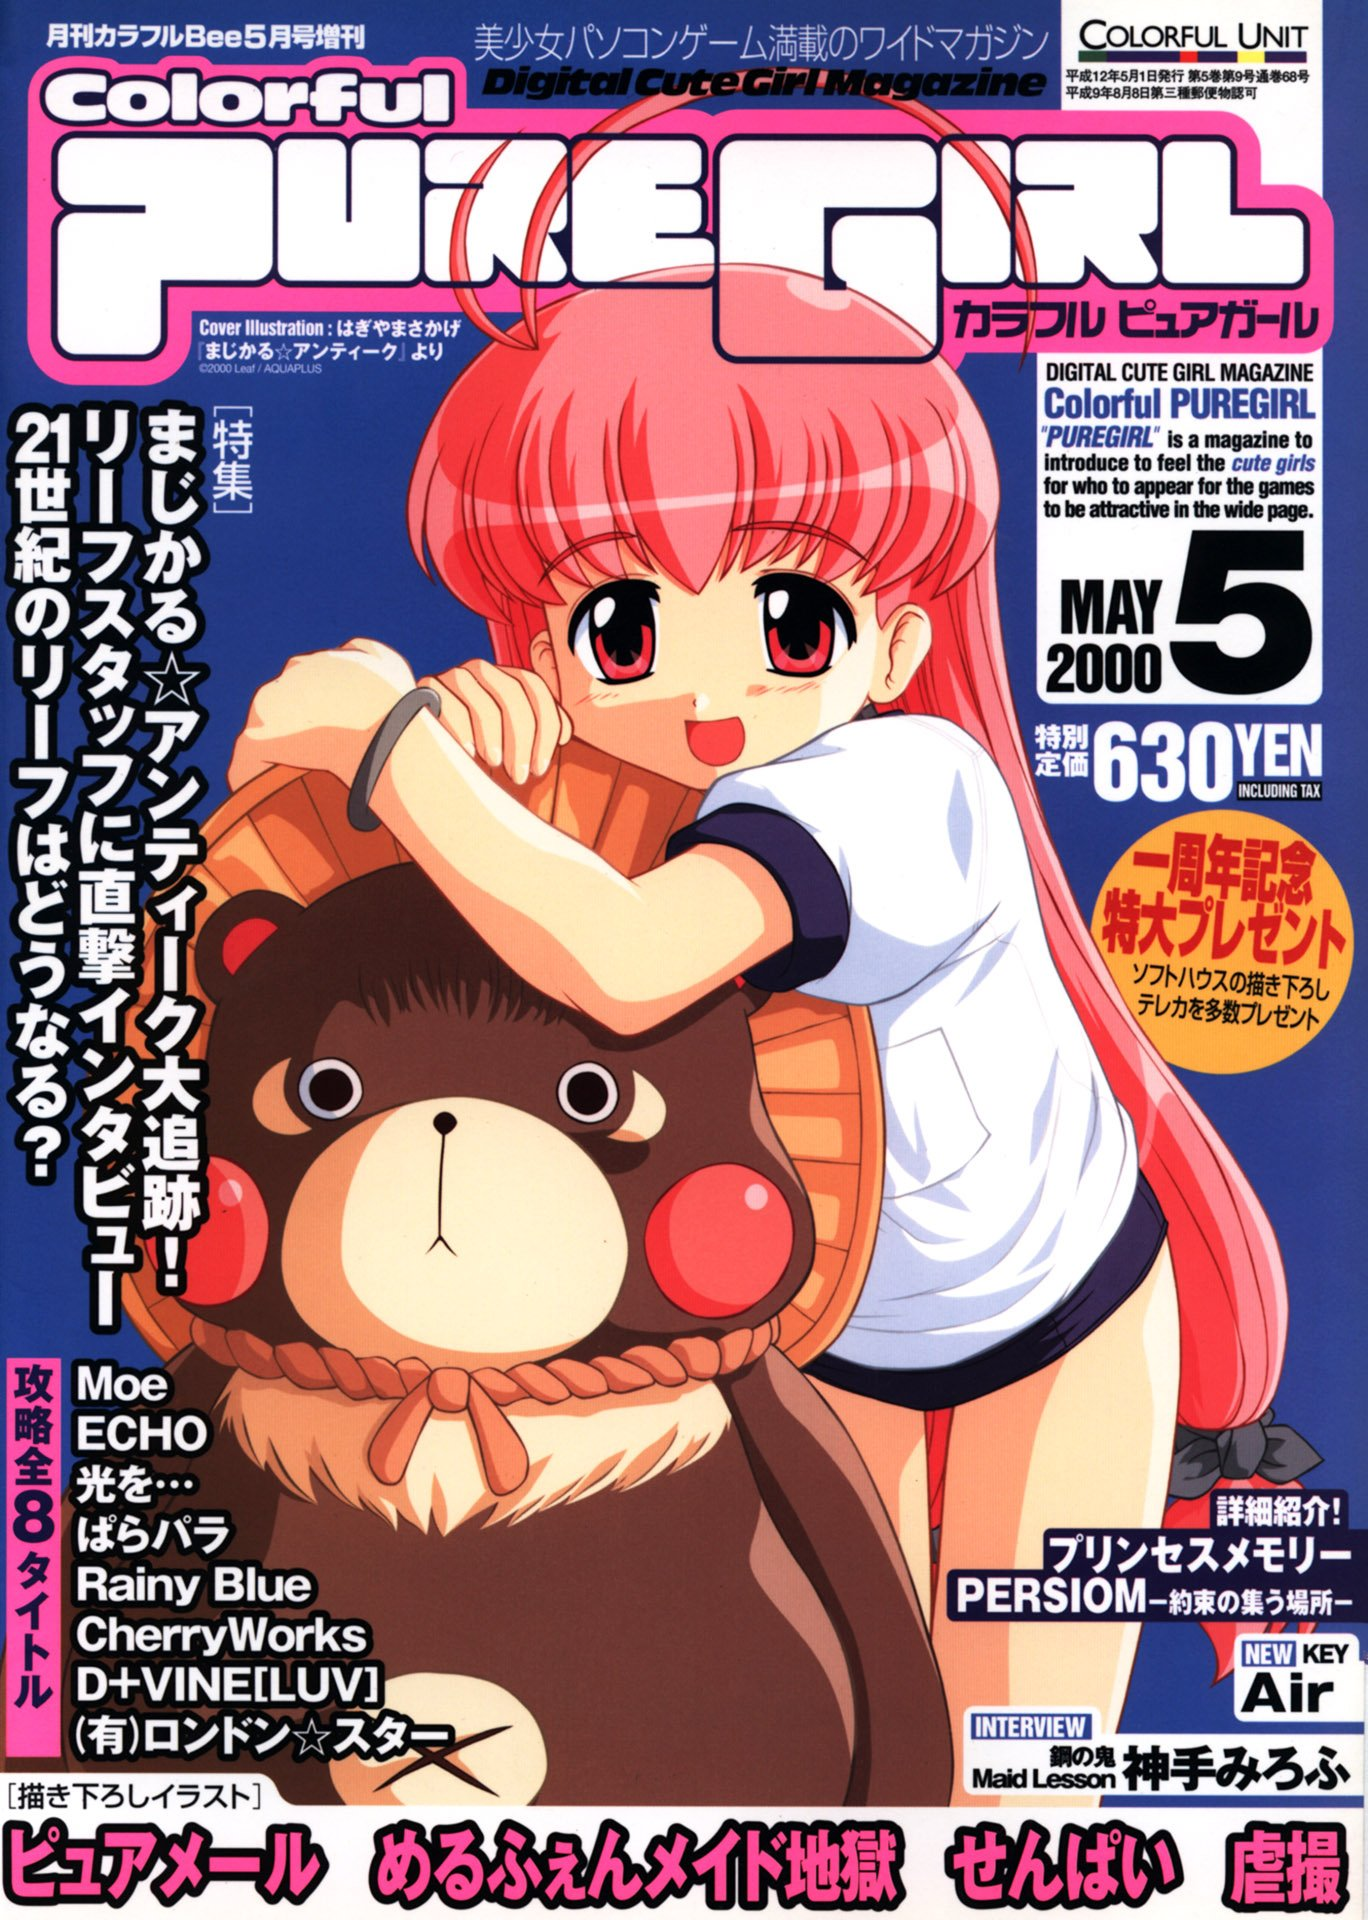 Colorful Puregirl Vol.13 (May 2000)